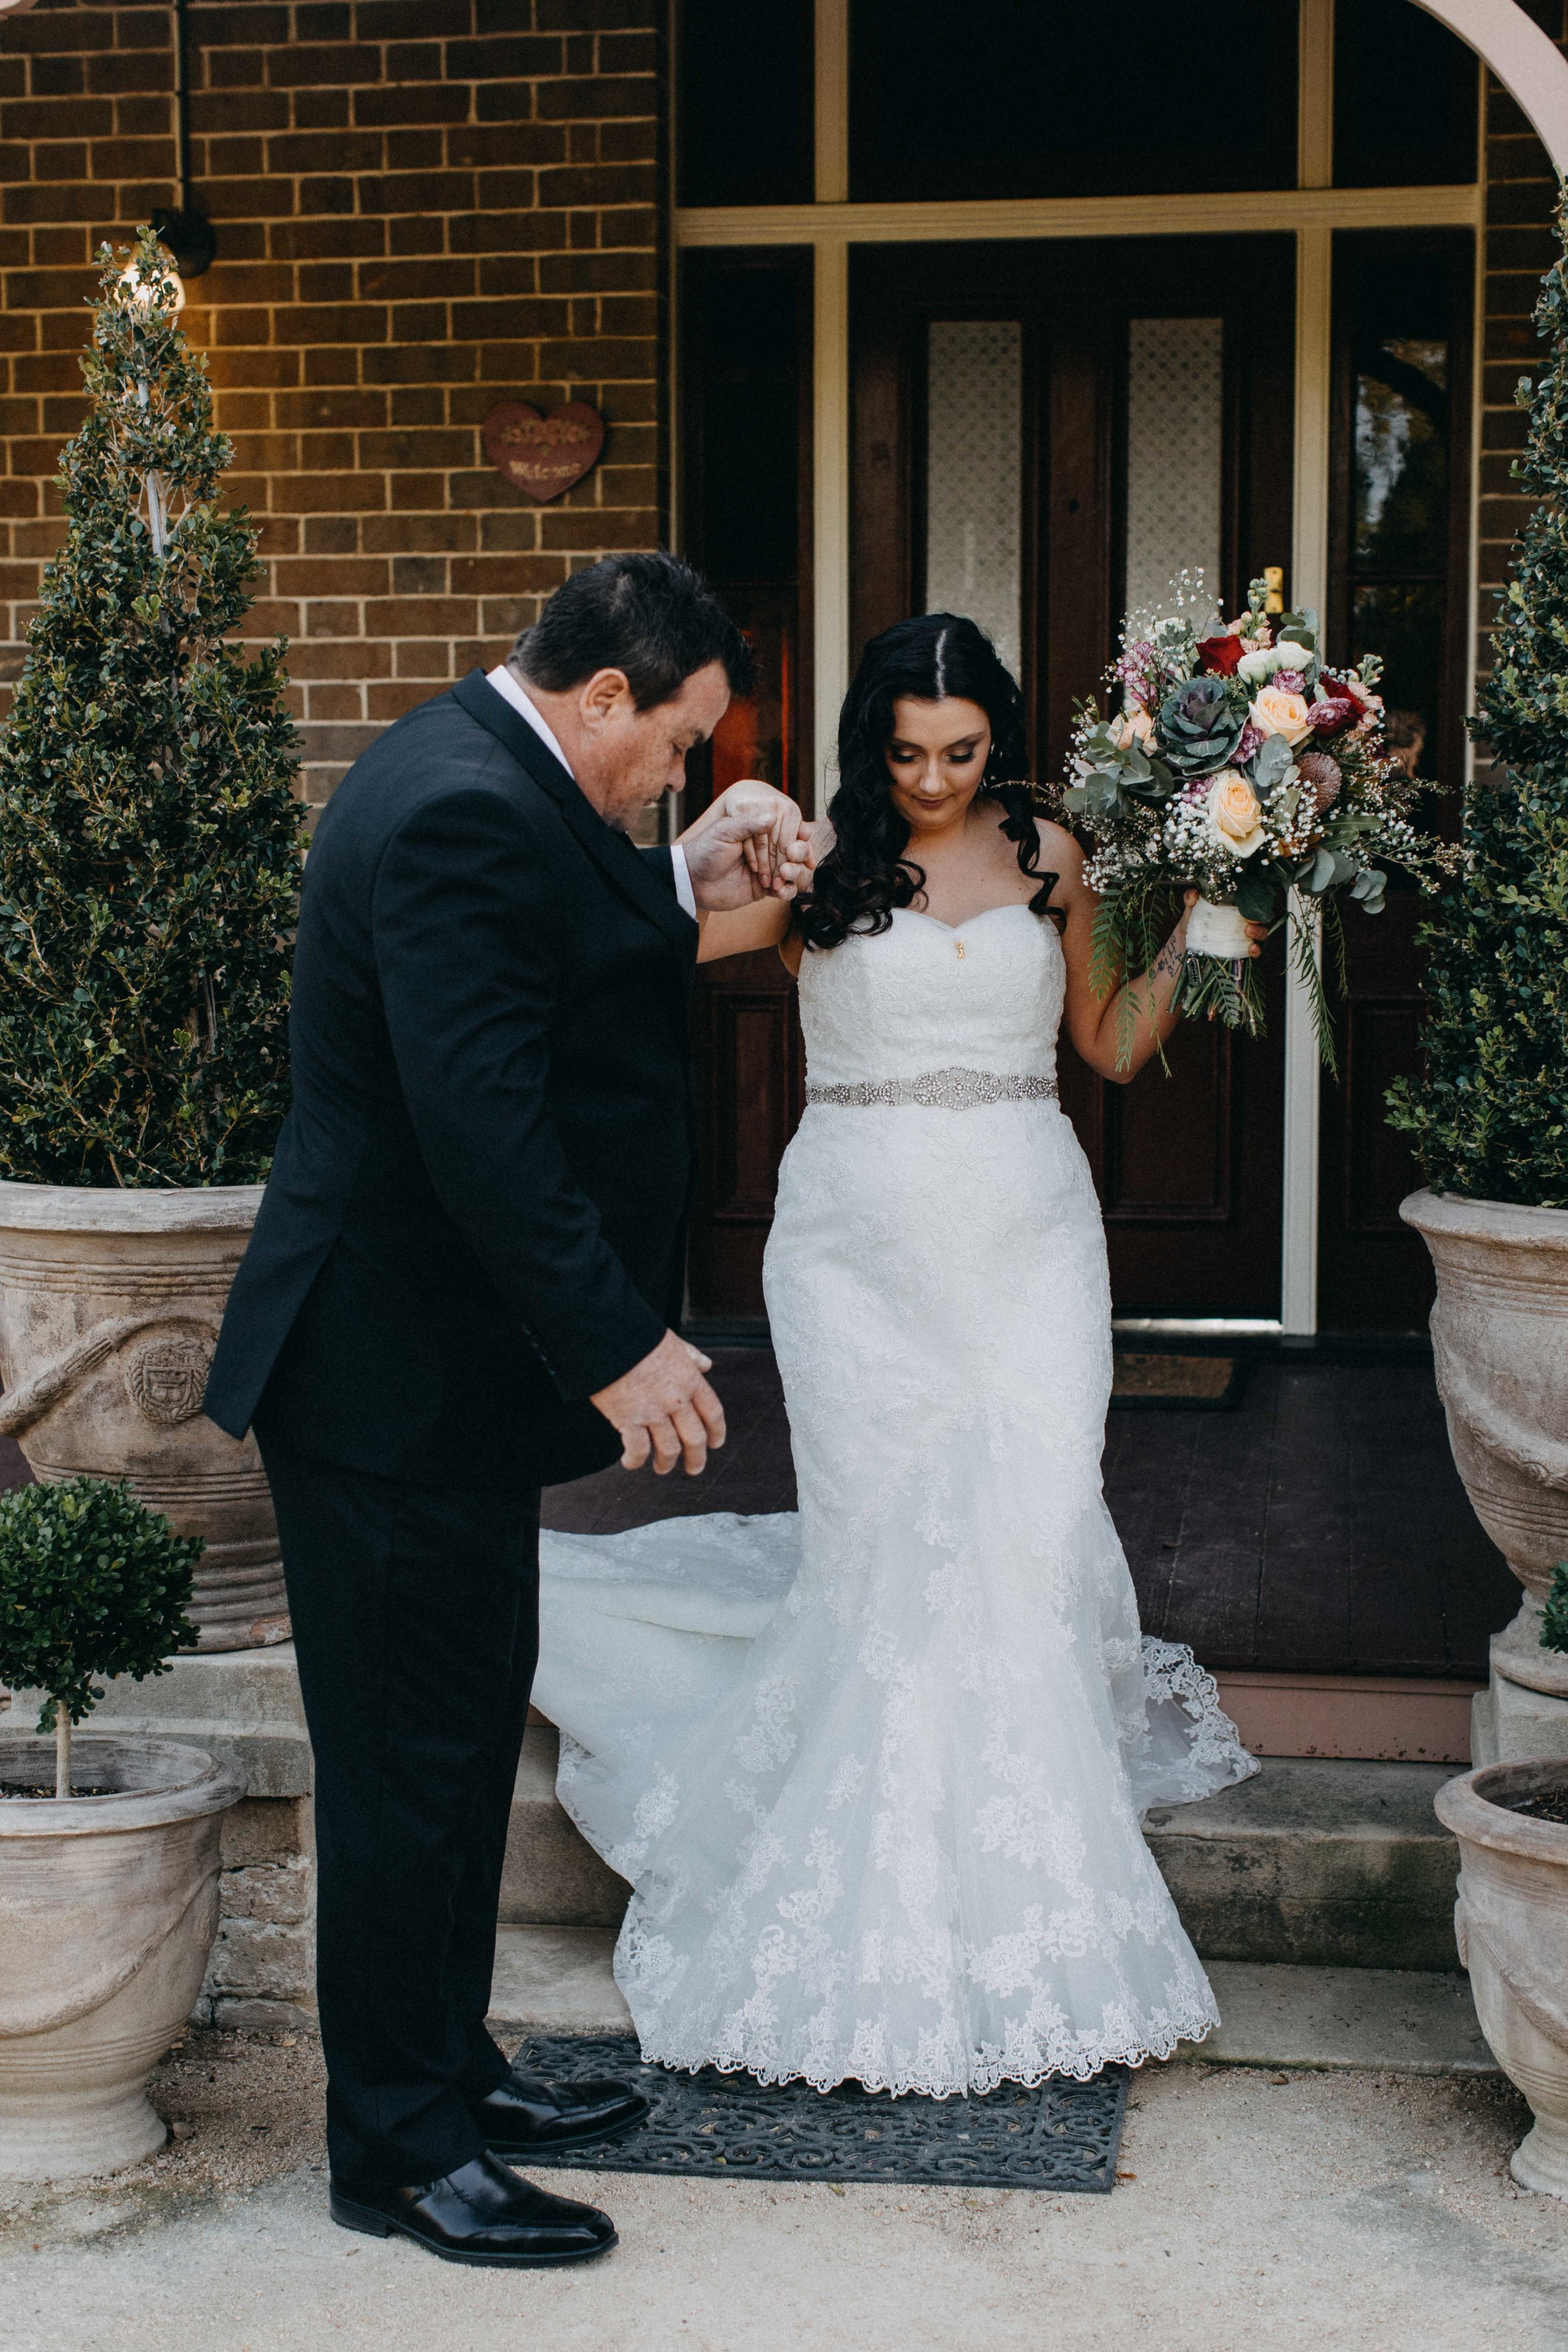 burnham-grove-camden-wedding-emilyobrienphotography-macarthur-49.jpg